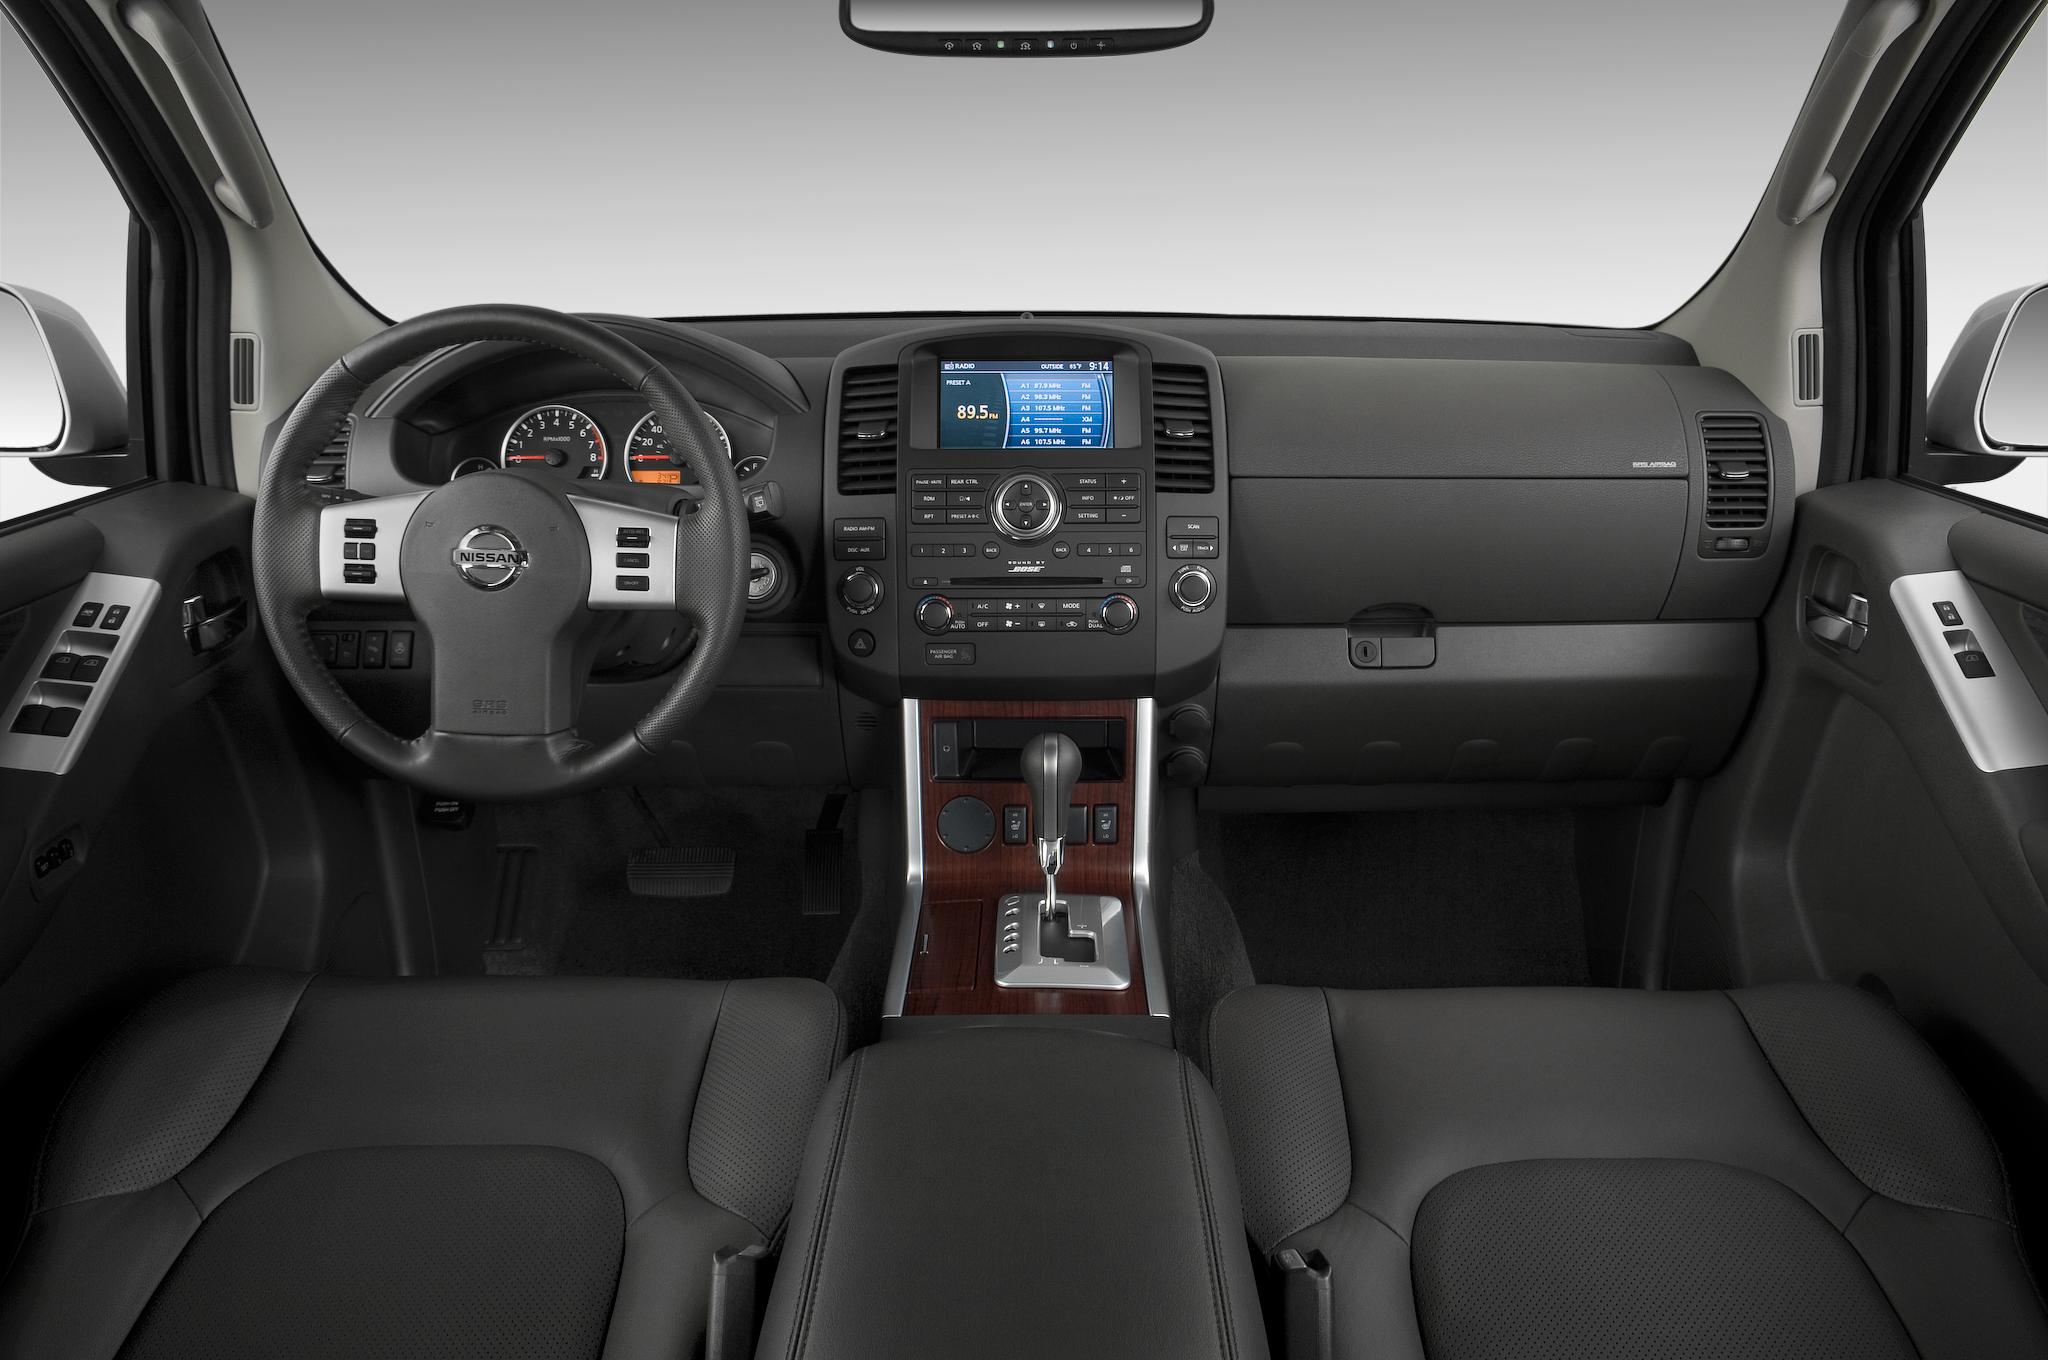 2013 Nissan Pathfinder Interior Revealed